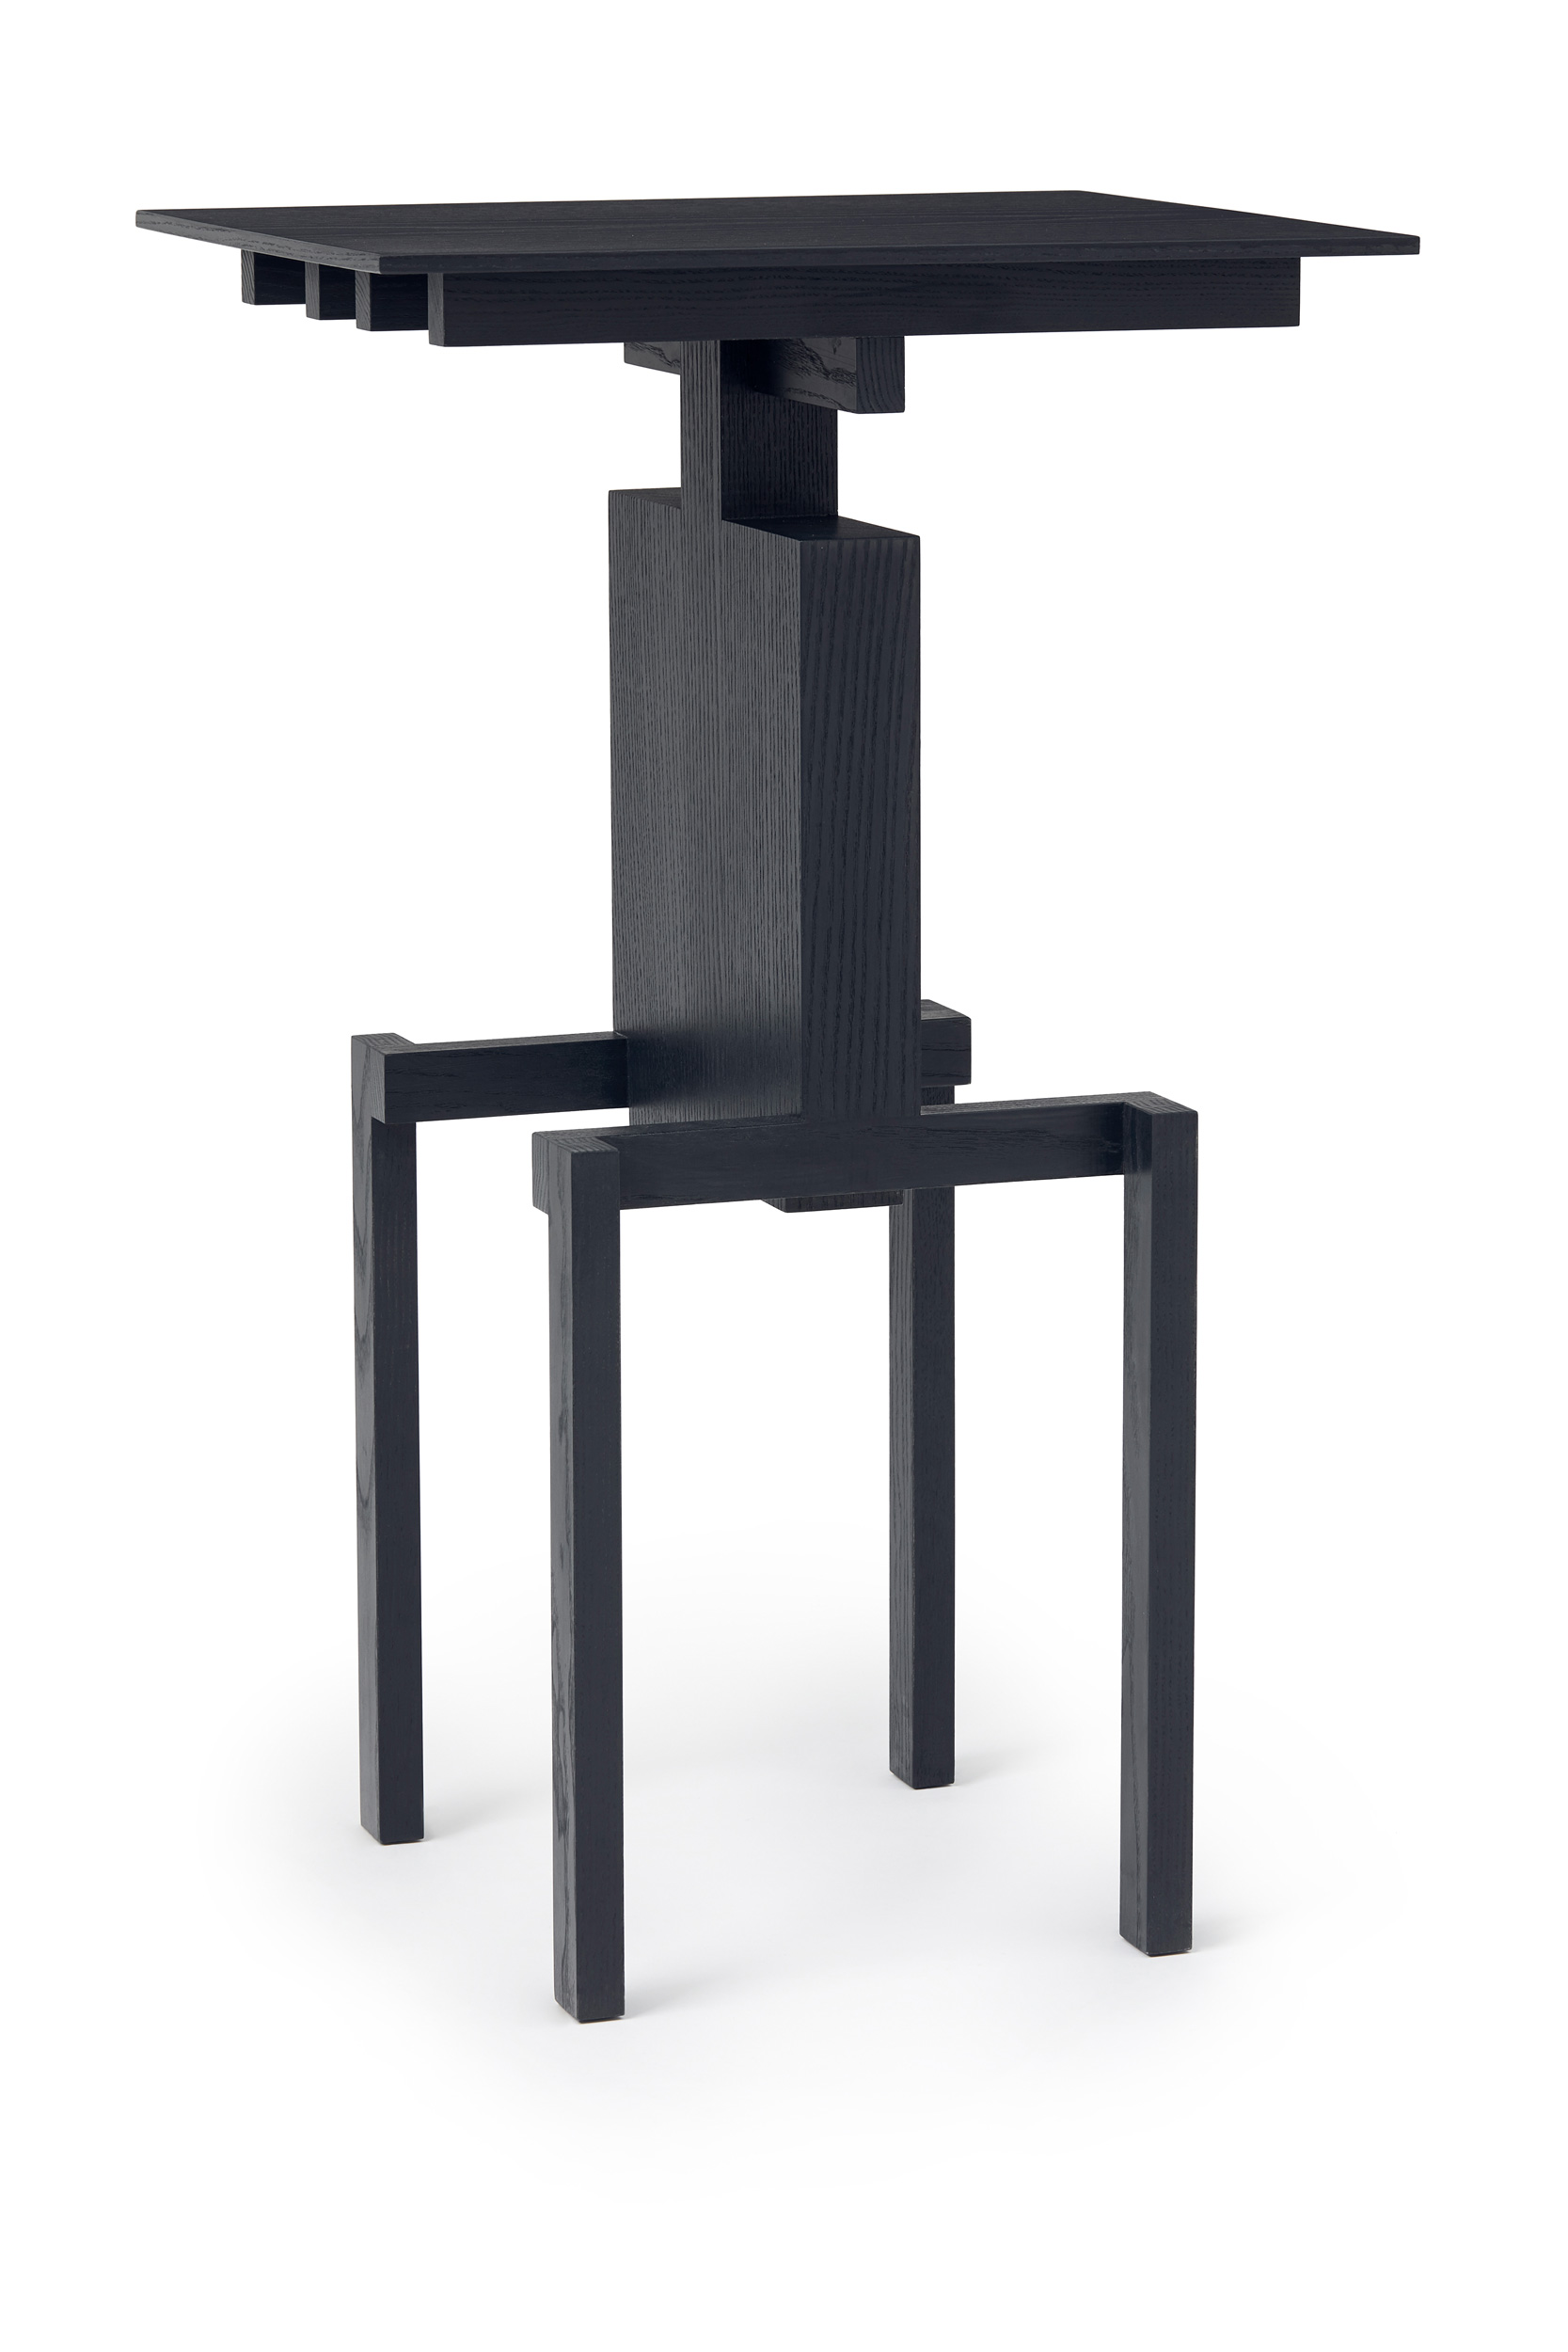 Studio-Pascal-Howe_SideTable_Black_Shop.jpg